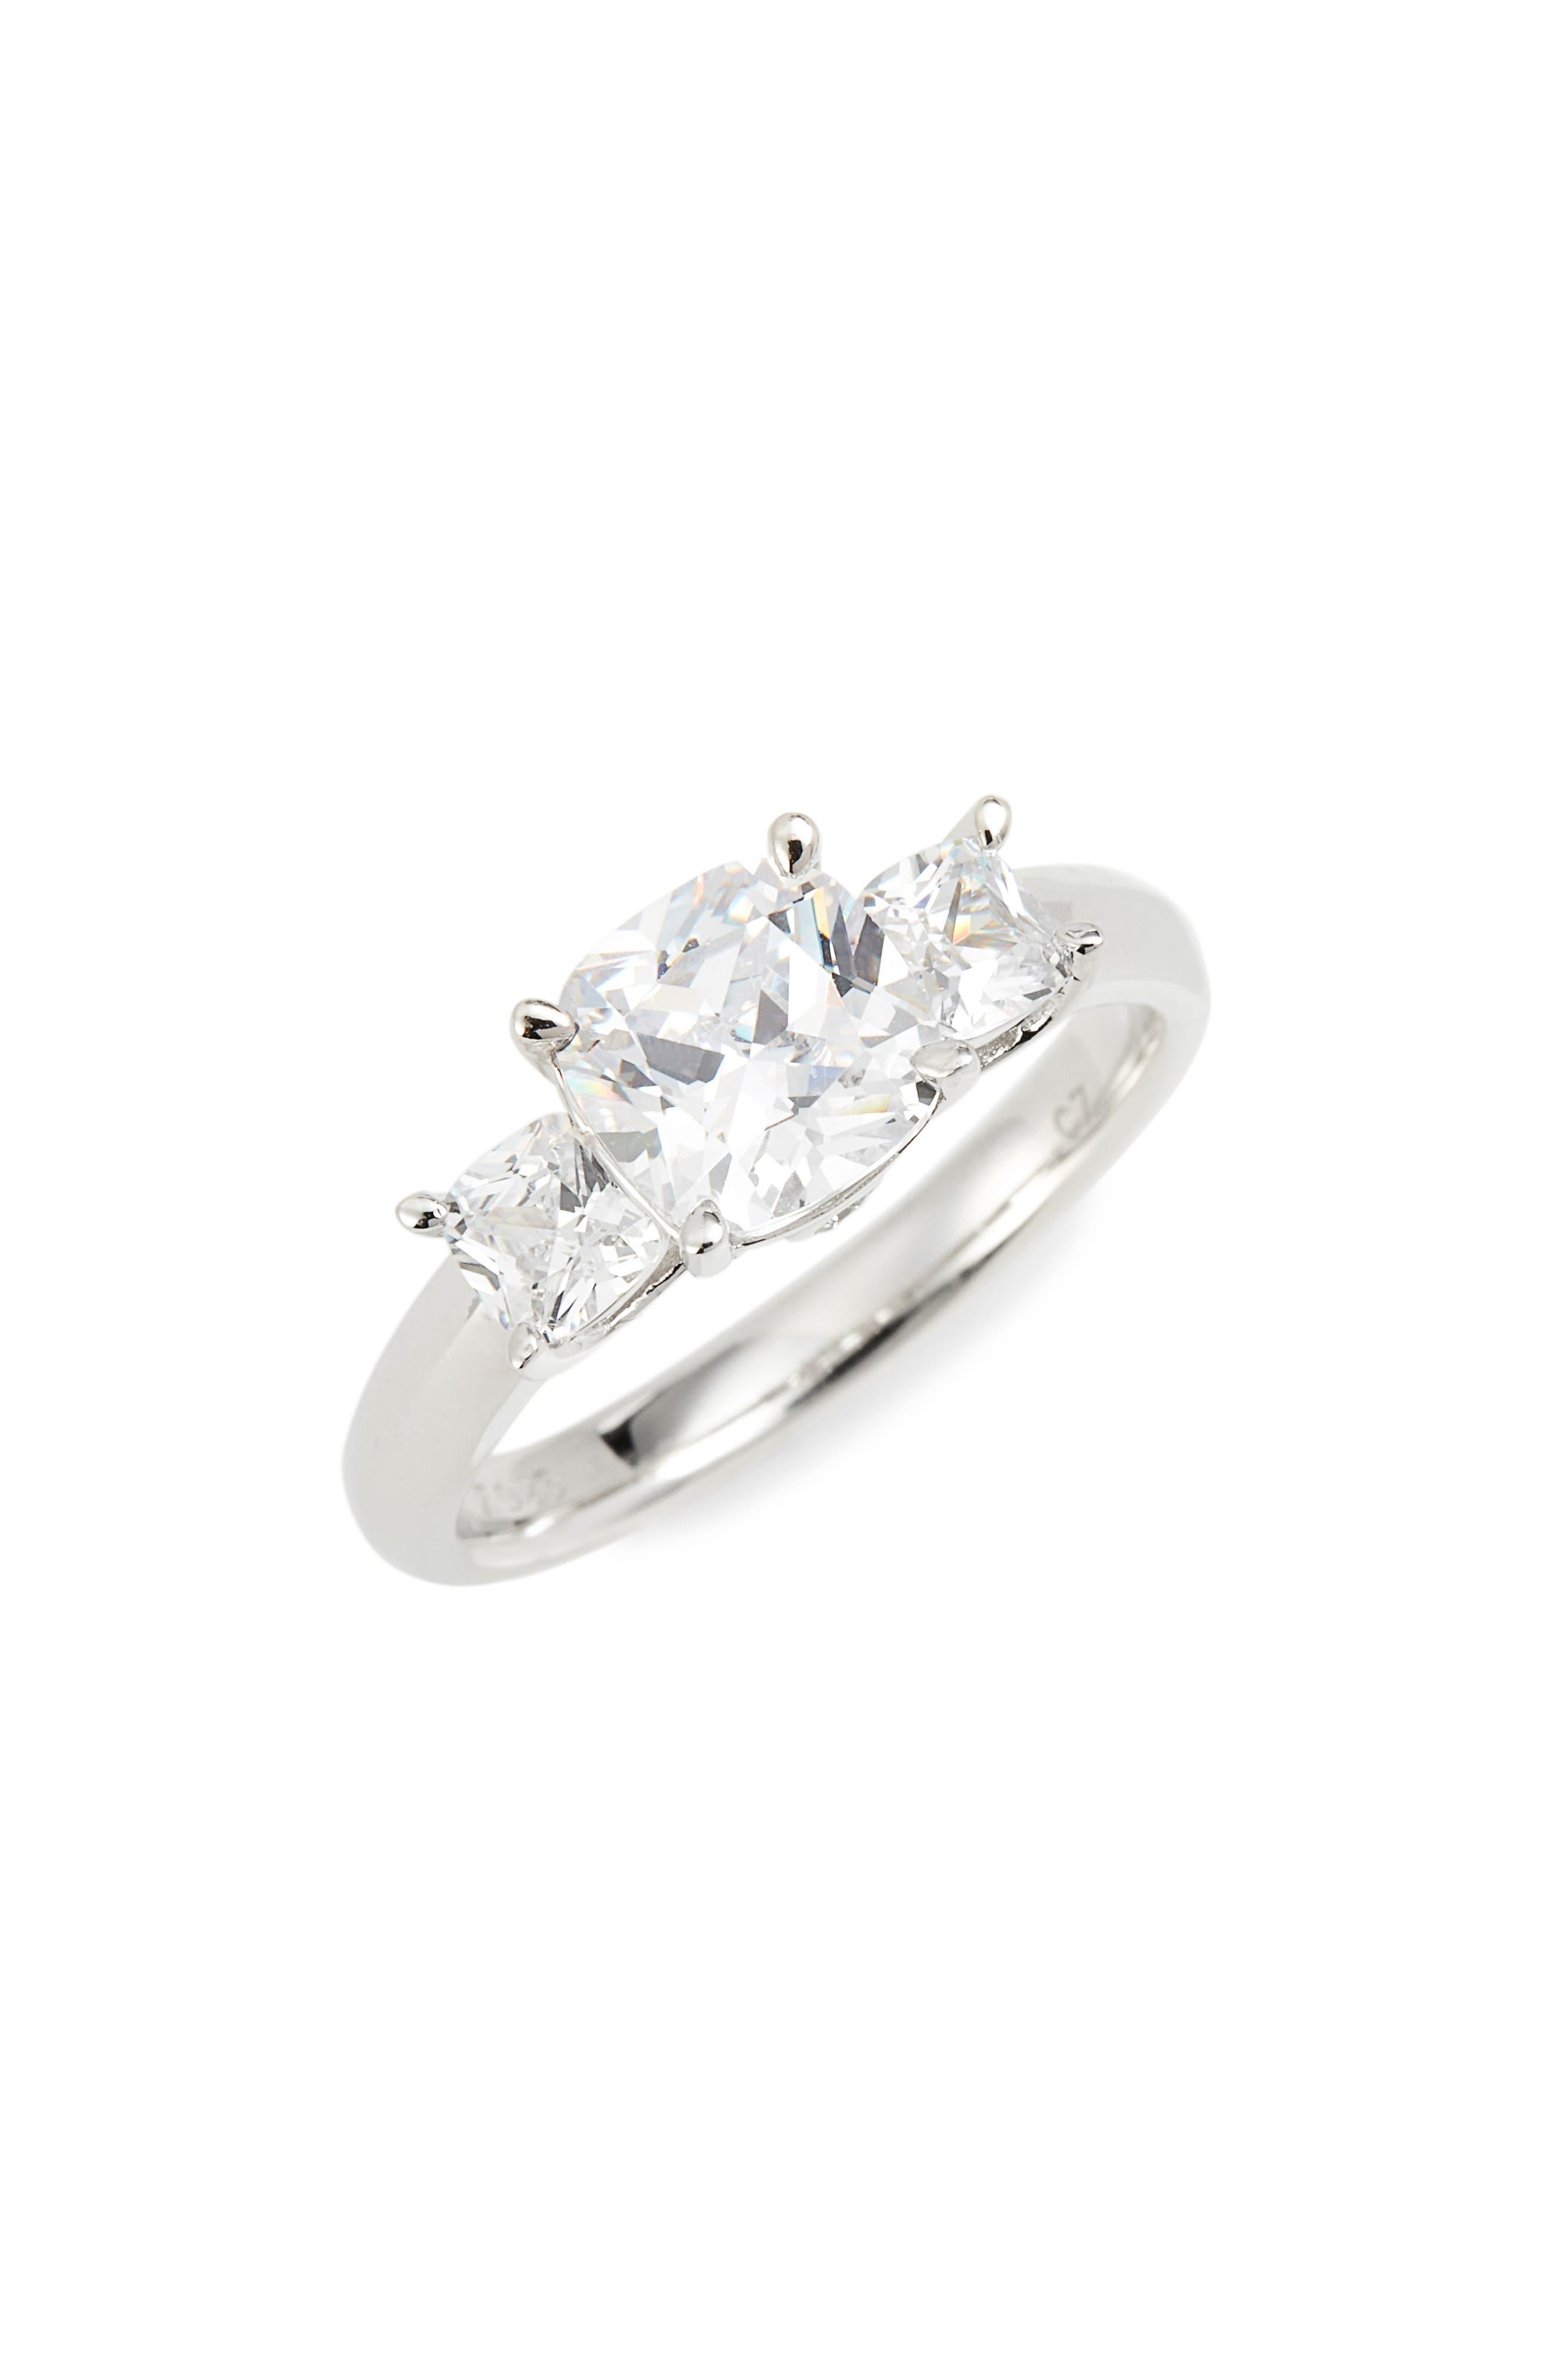 3-Stone Cushion Ring,                             Main thumbnail 1, color,                             Platinum